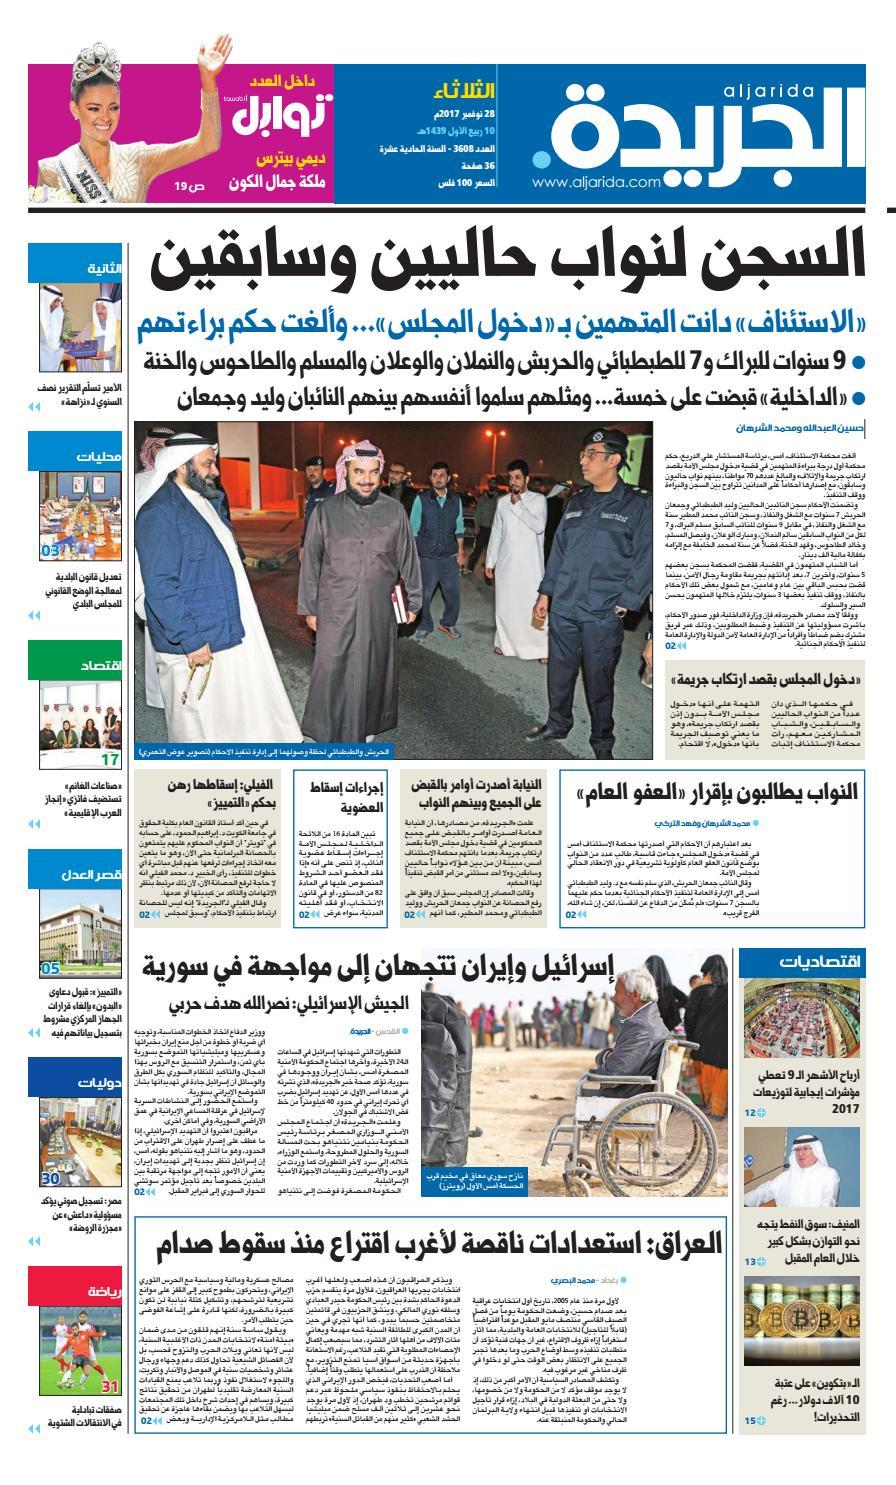 cb9ac16ae عدد الجريدة الثلاثاء 28 نوفمبر 2017 by Aljarida Newspaper - issuu